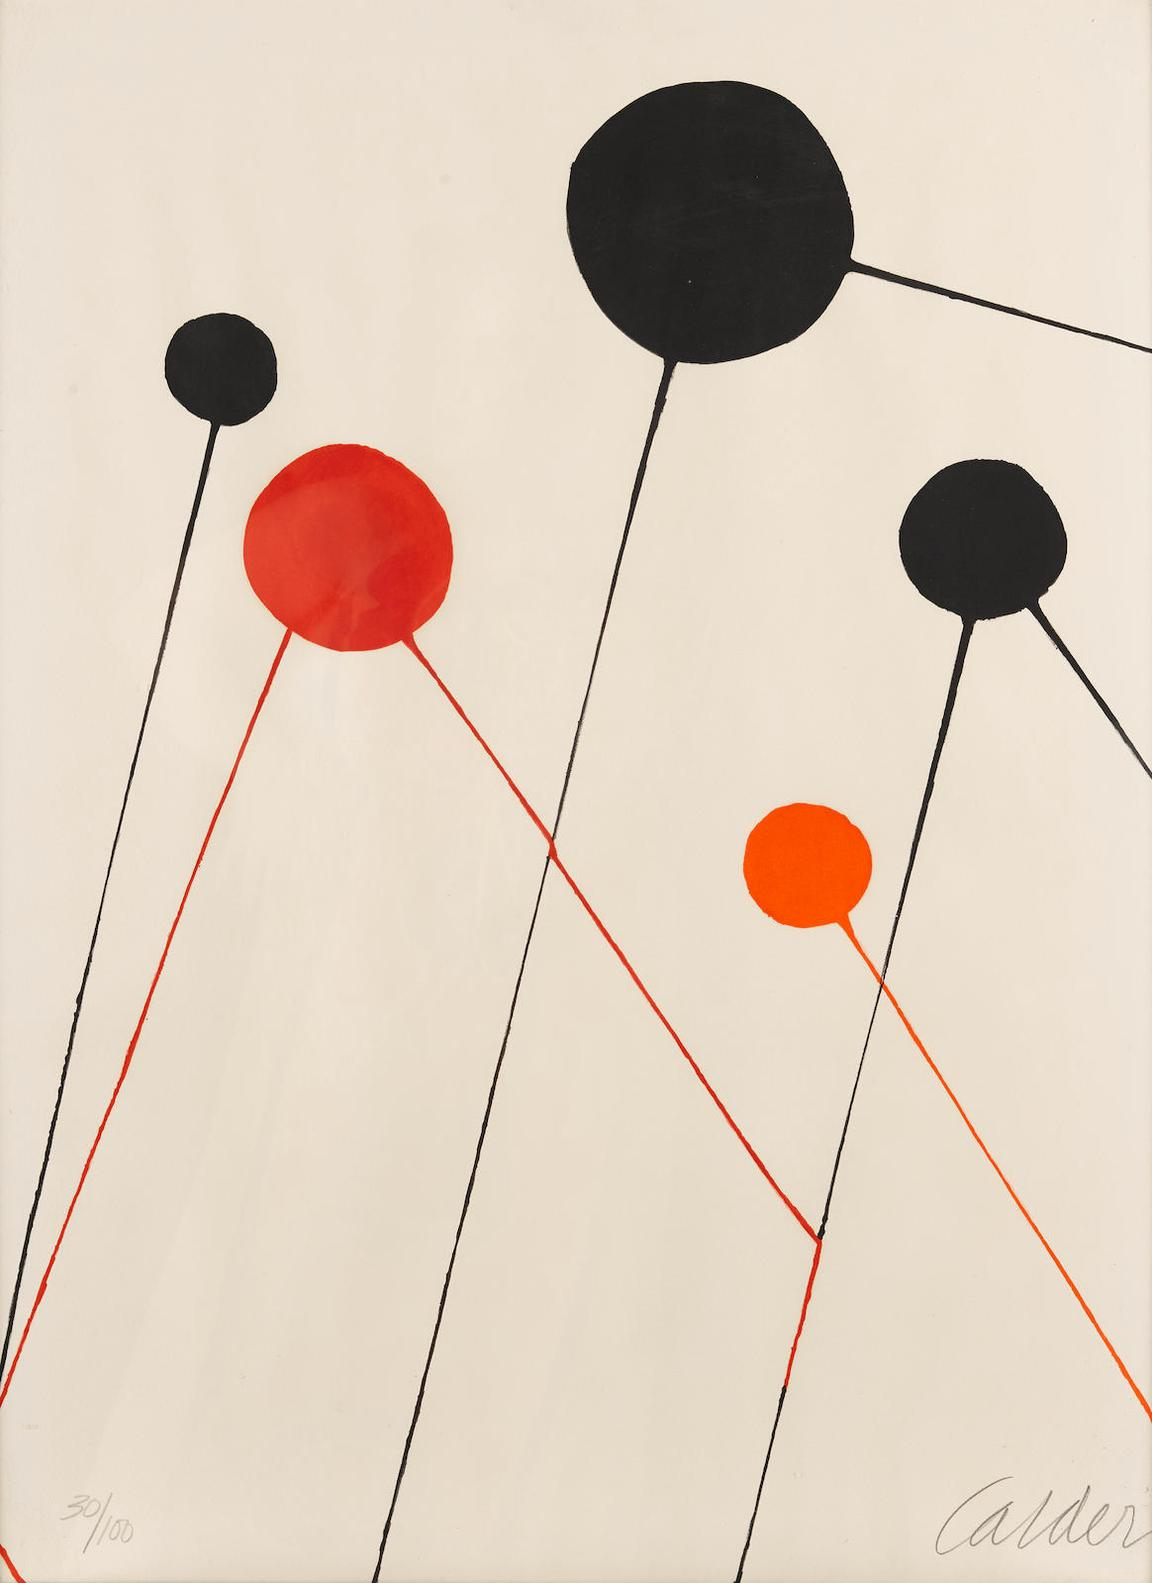 Alexander Calder-Untitled (Balloons)-1968